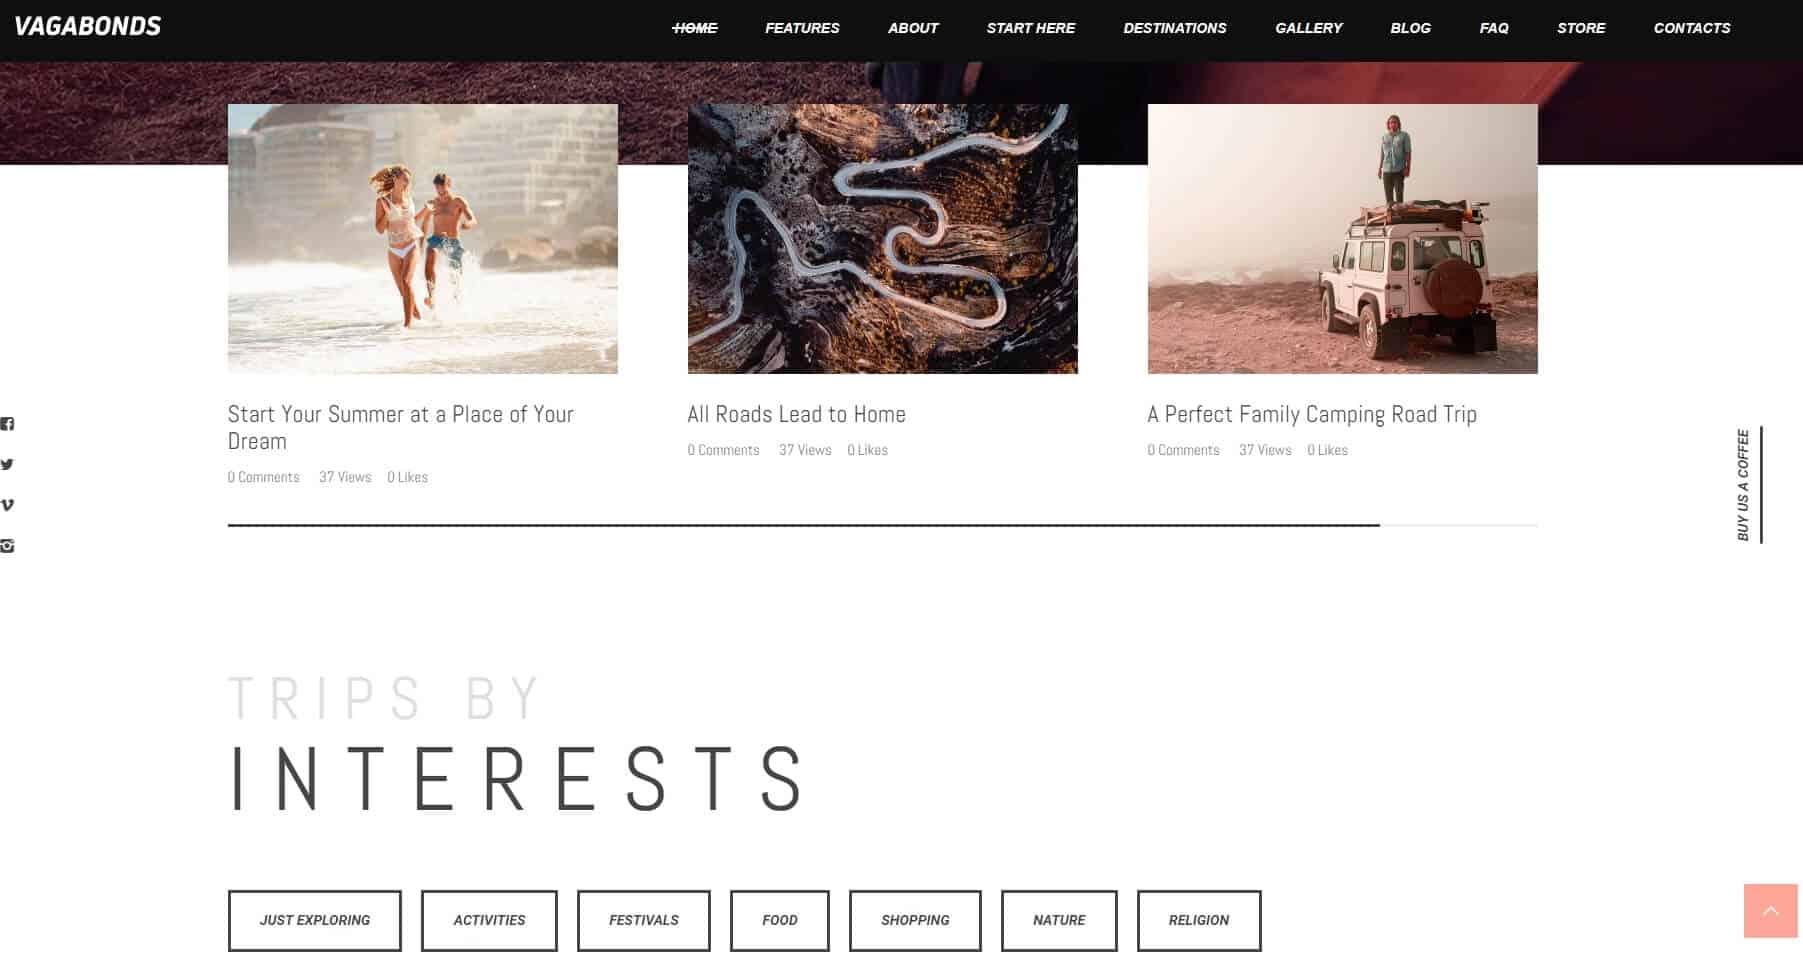 Vagabonds – Travel Storytelling – Just another WordPress site